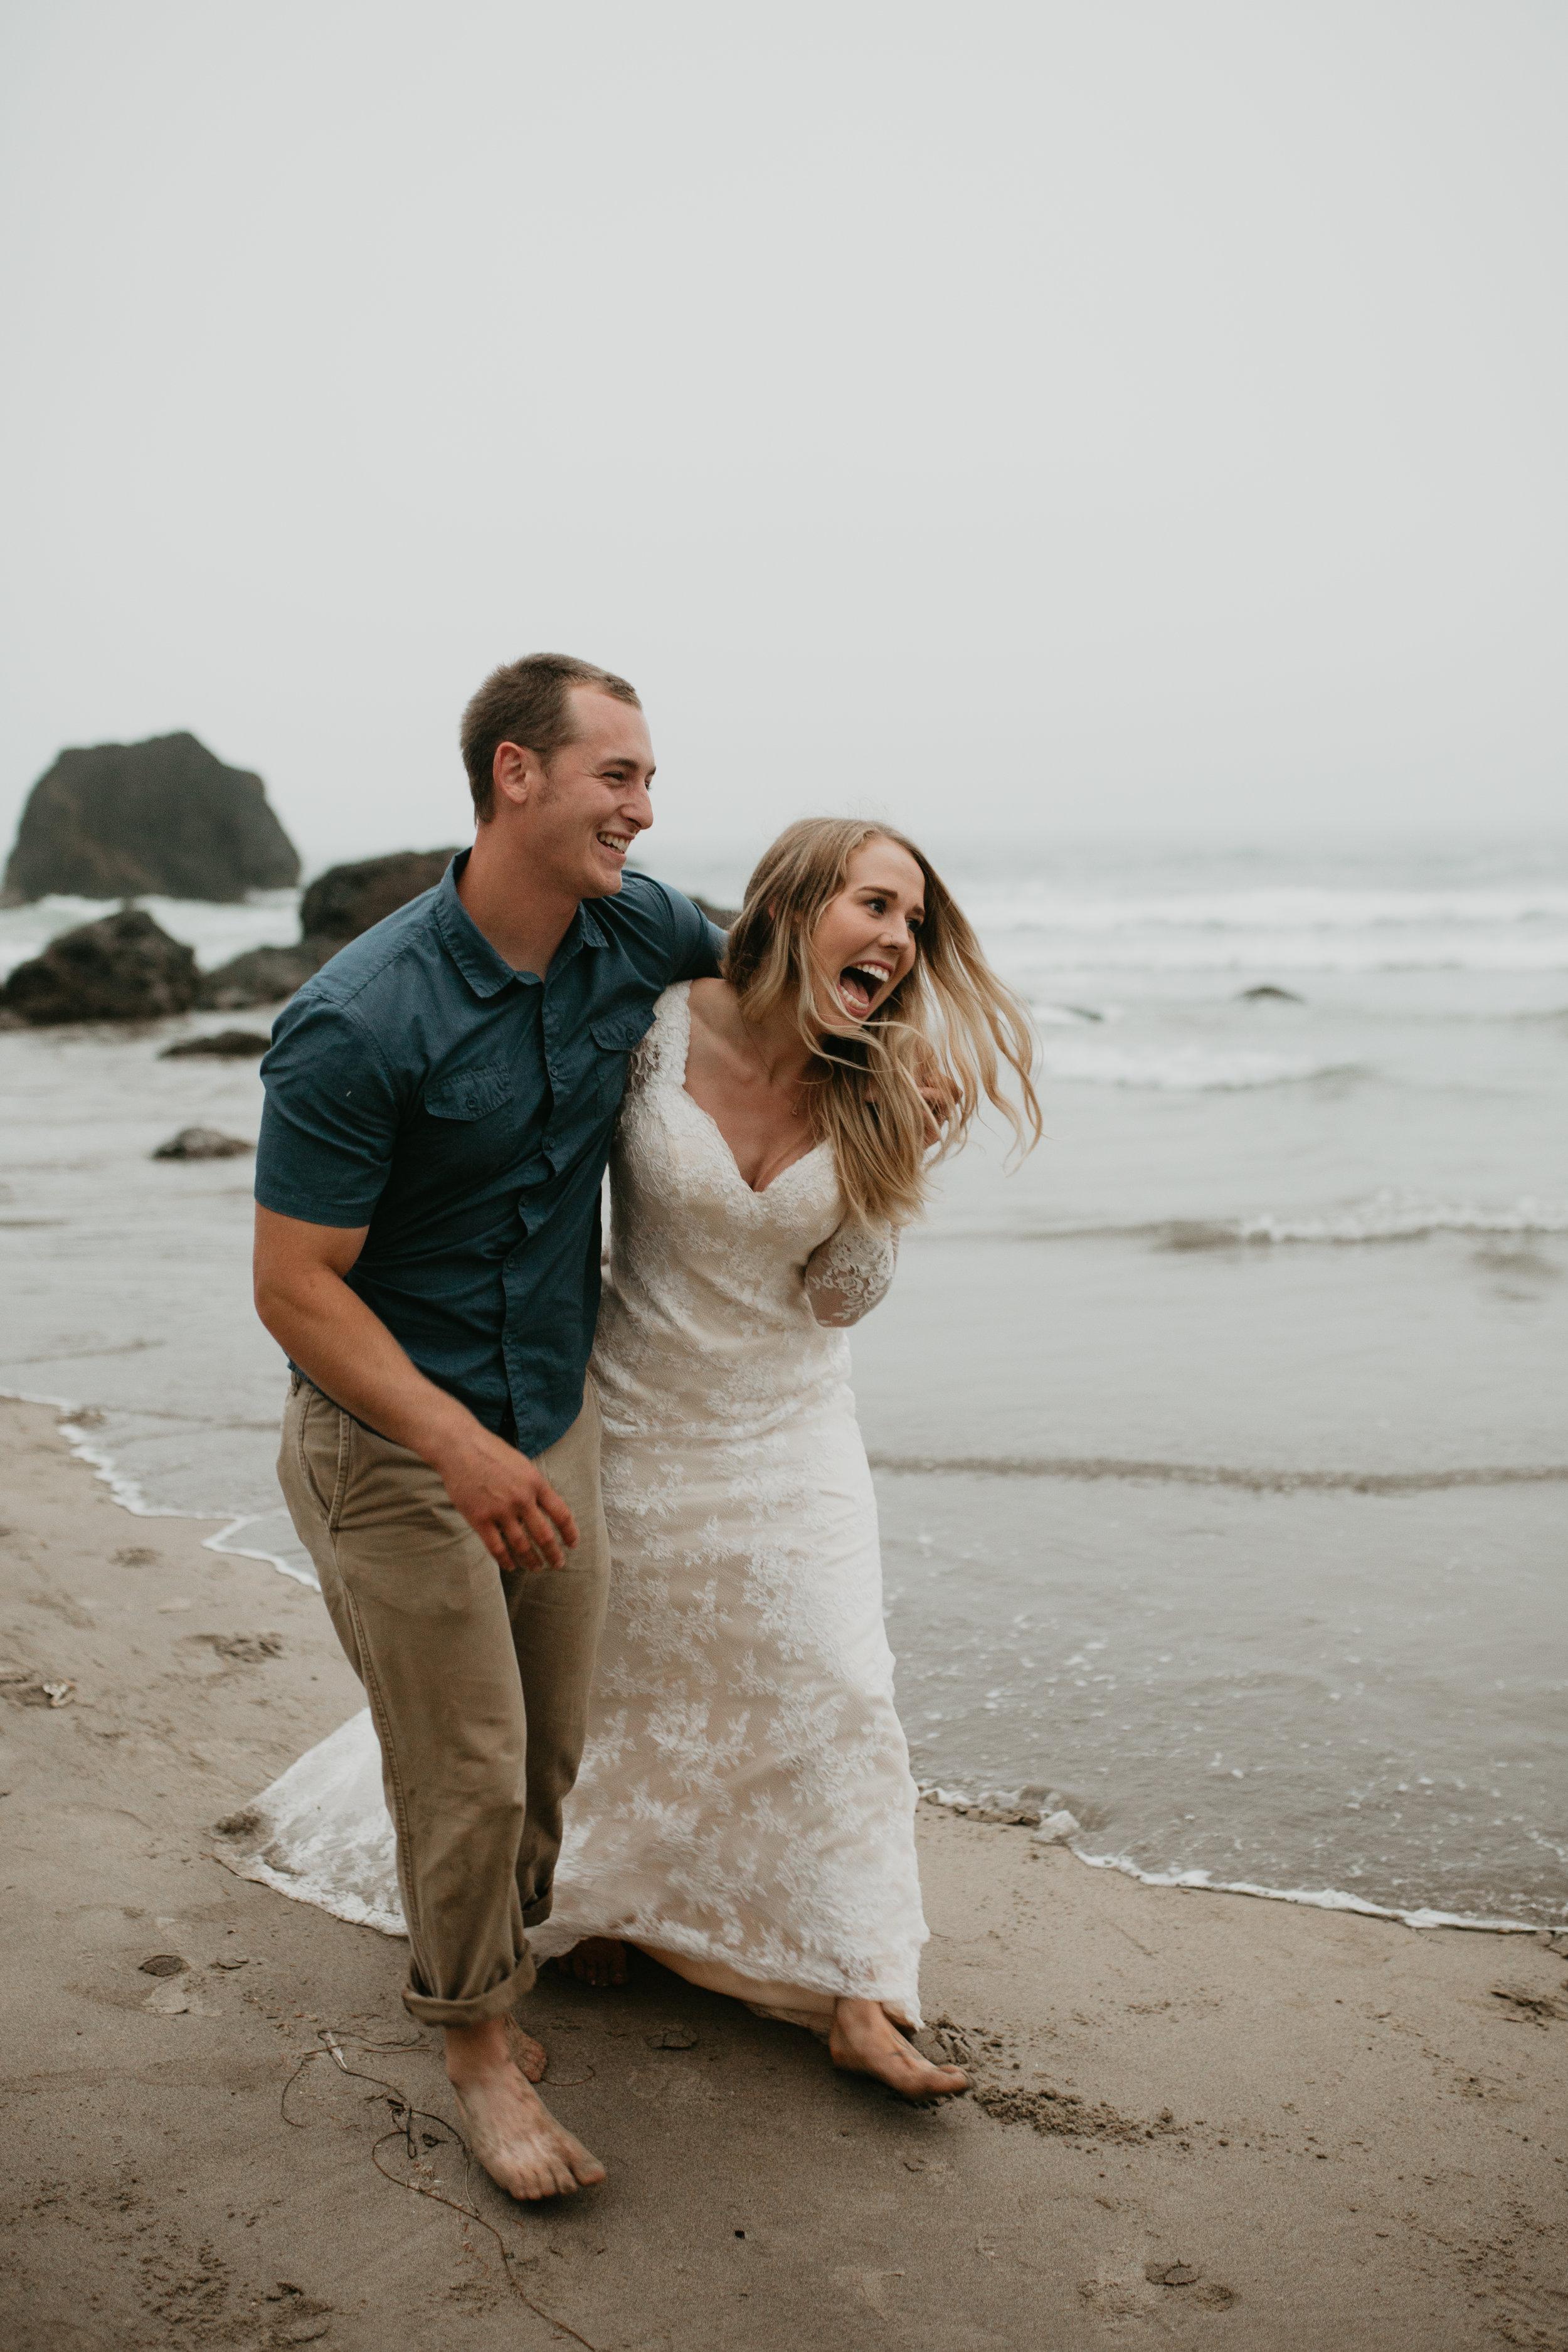 nicole-daacke-photography-ecola-state-park-oregon-elopement-bridal-photos-photographer-for-cannon-beach-elopement-oregon-coast-elopement-photographer-foggy-summer-elopement-cannon-beach-best-adventure-elopement-photographer-7124.jpg